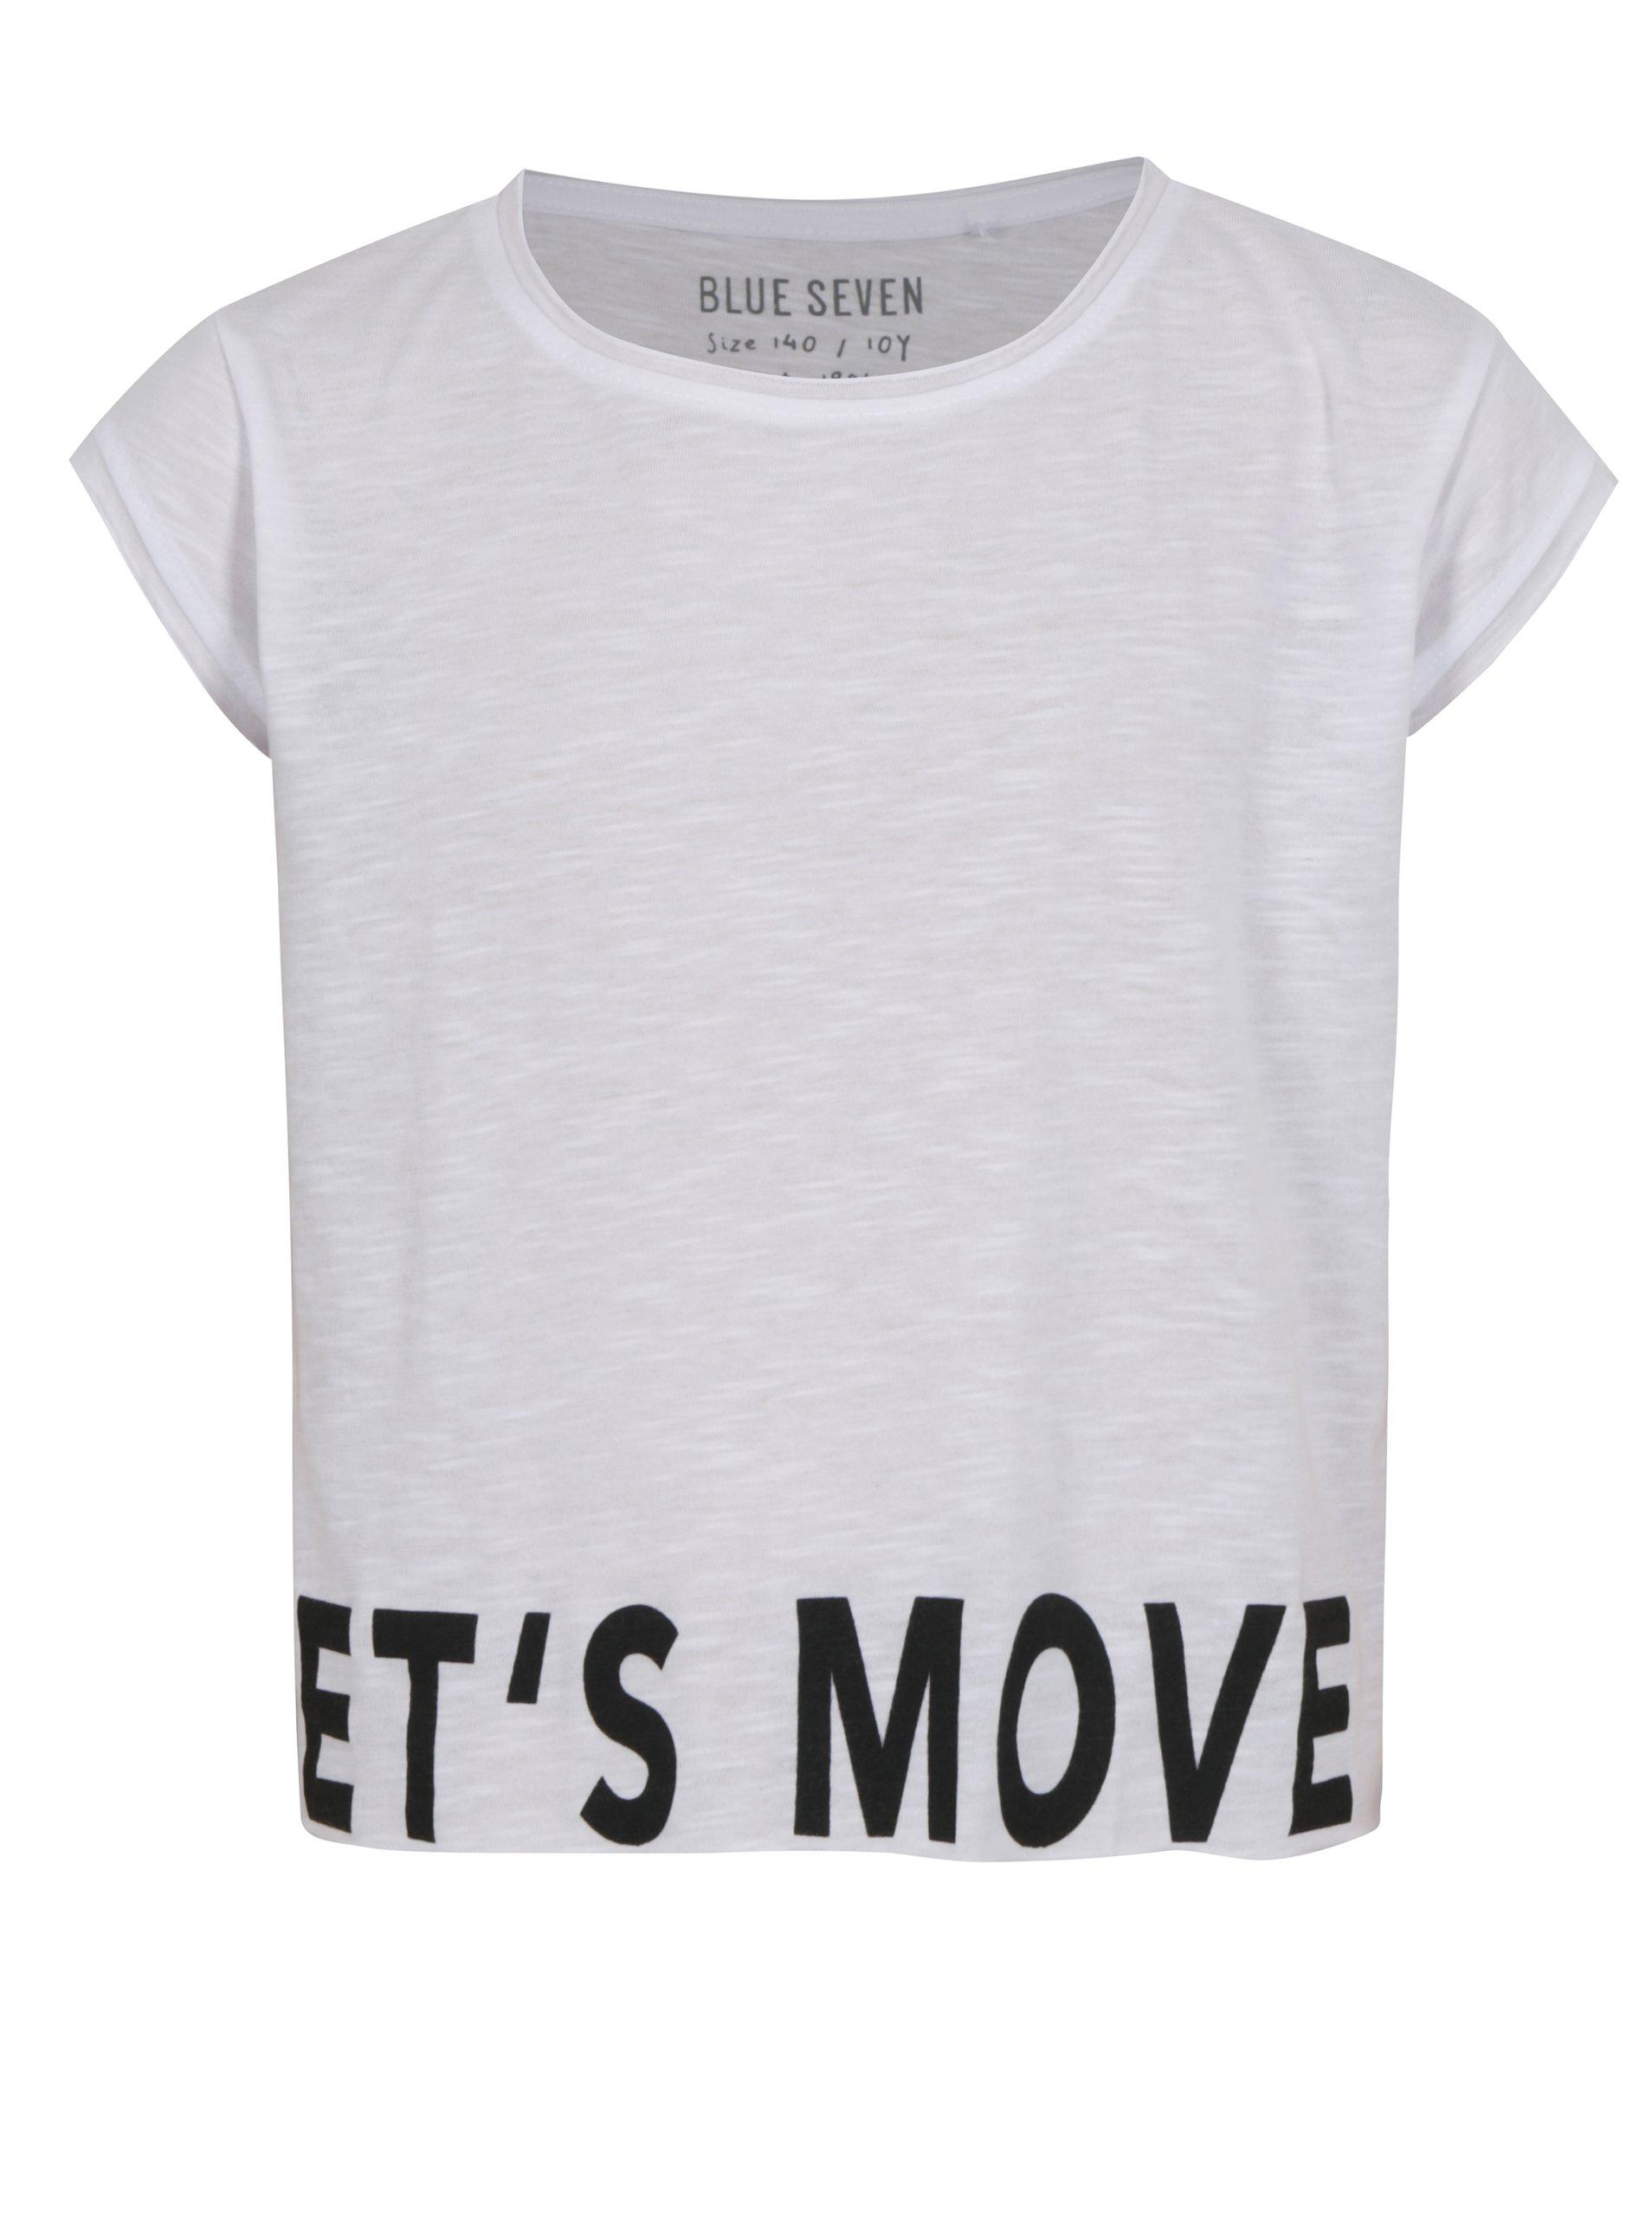 Biele dievčenské krátke tričko s nápisom Blue Seven